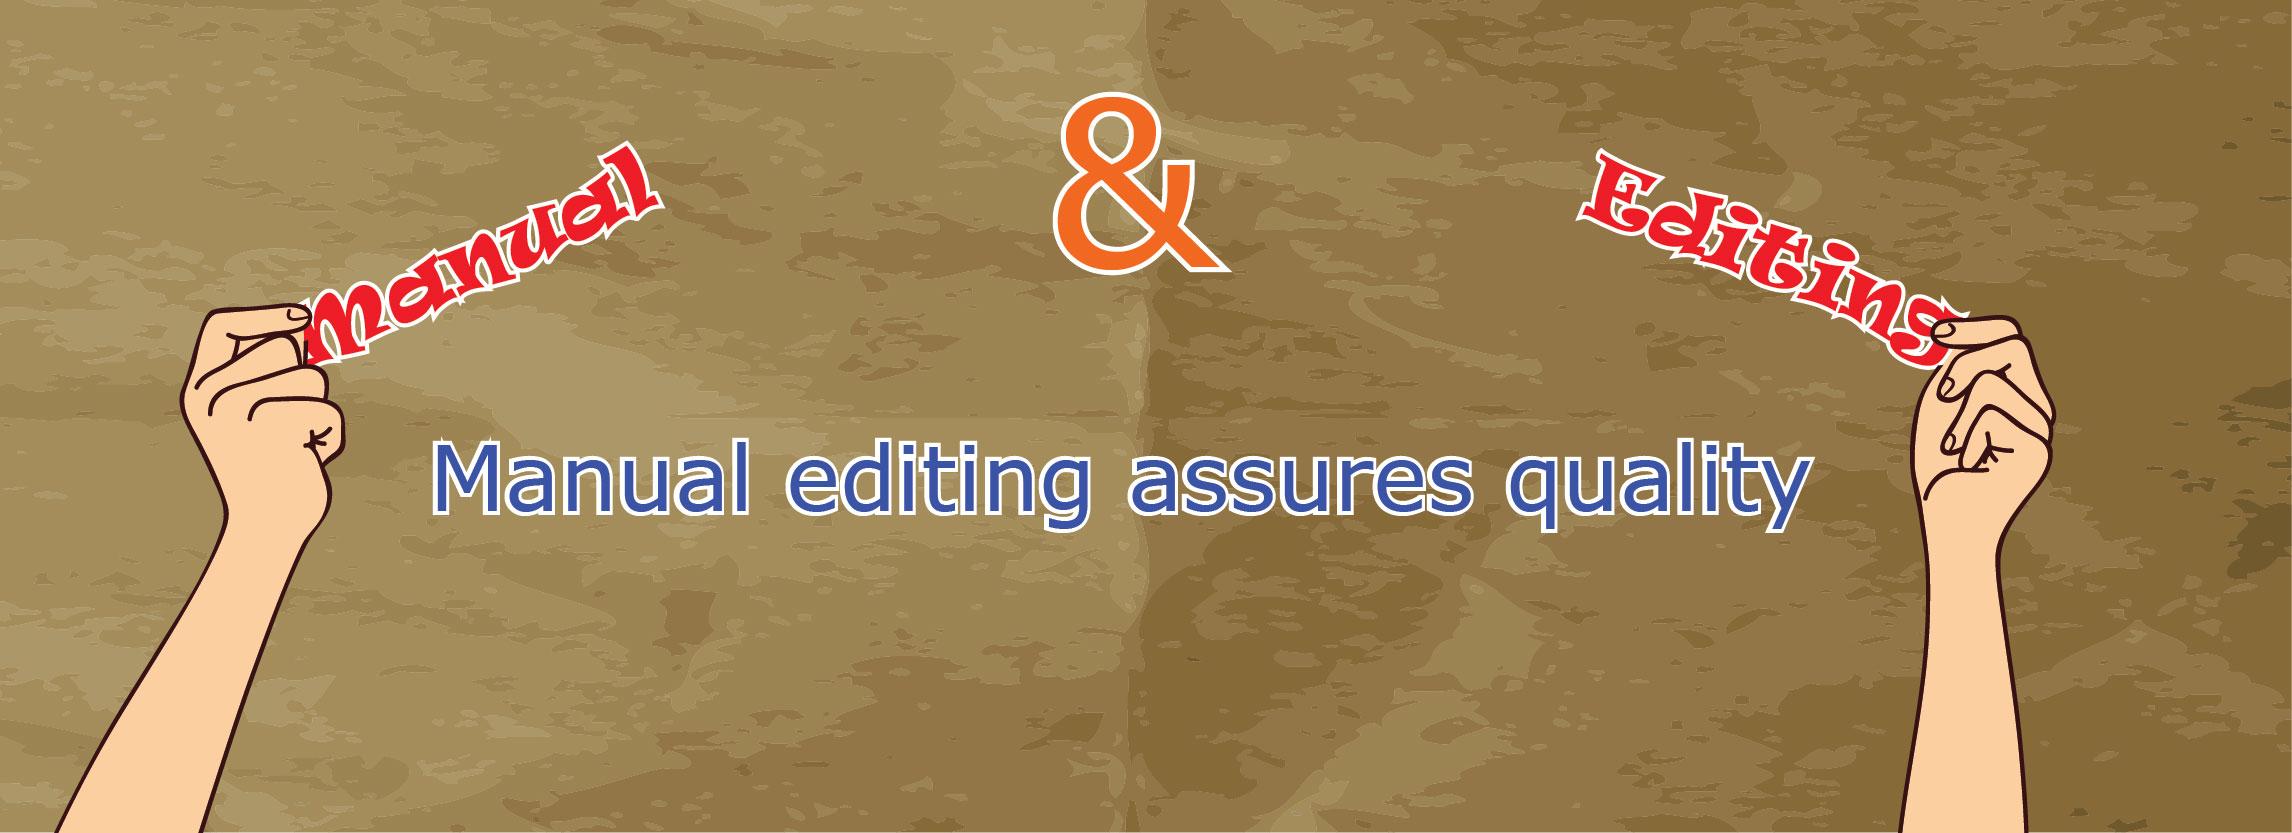 Manual editing assures quality-01